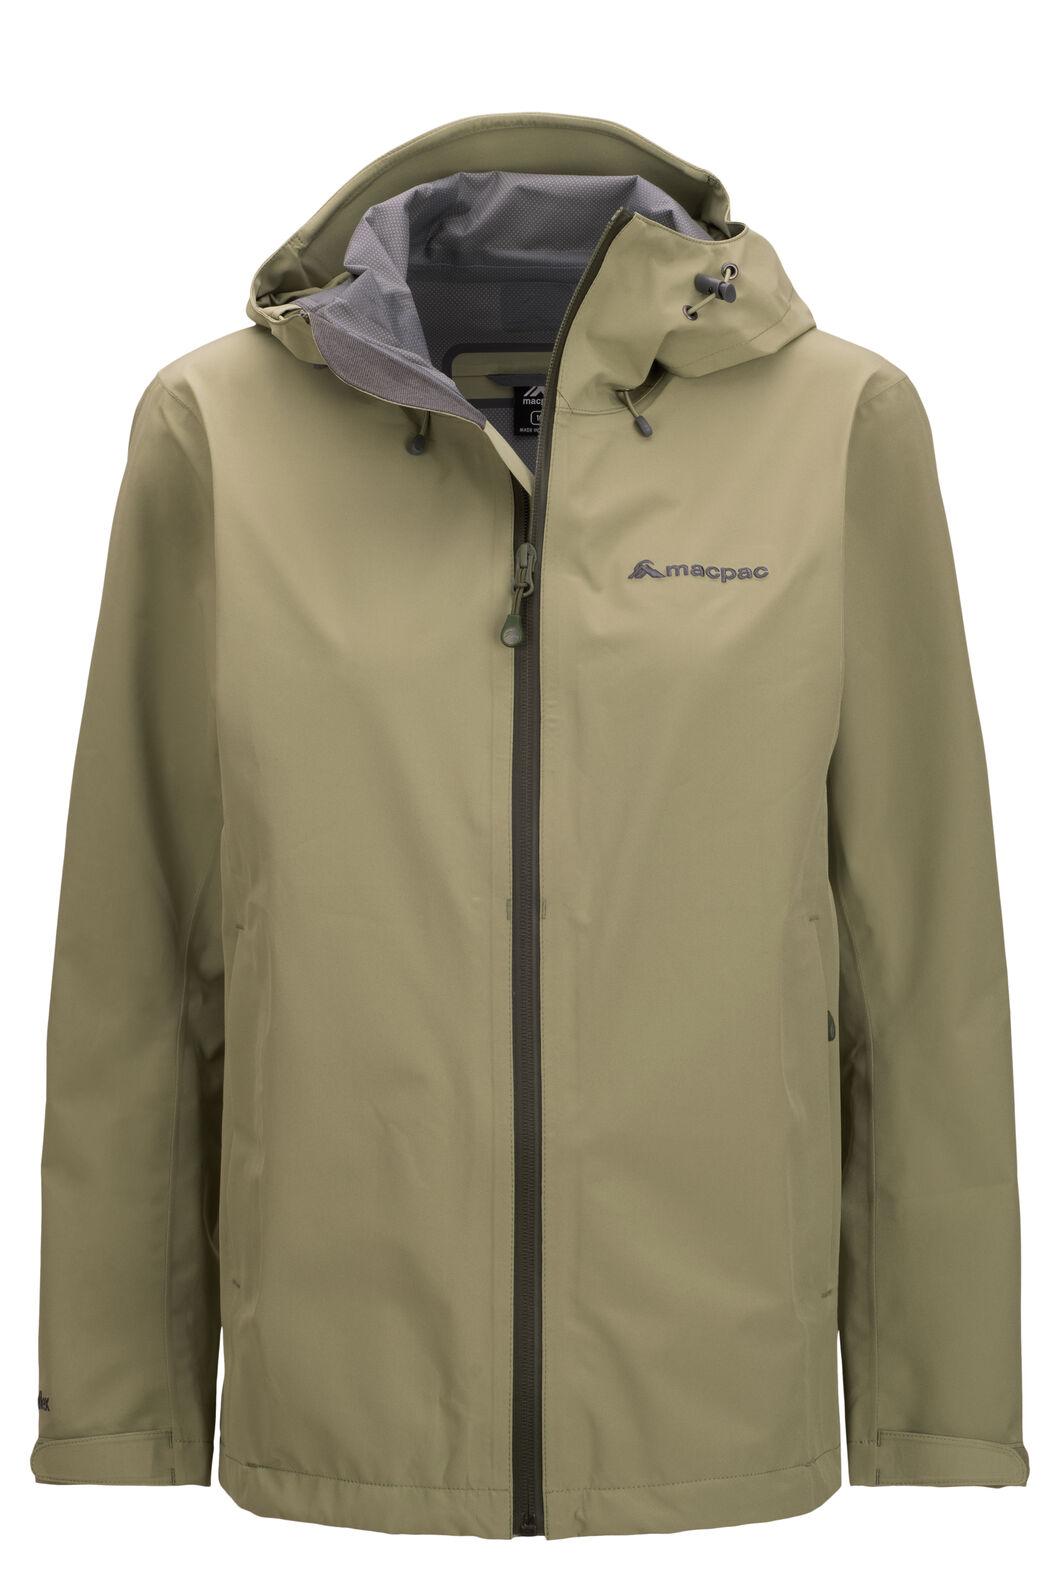 Macpac Women's Dispatch Rain Jacket, Oil Green, hi-res